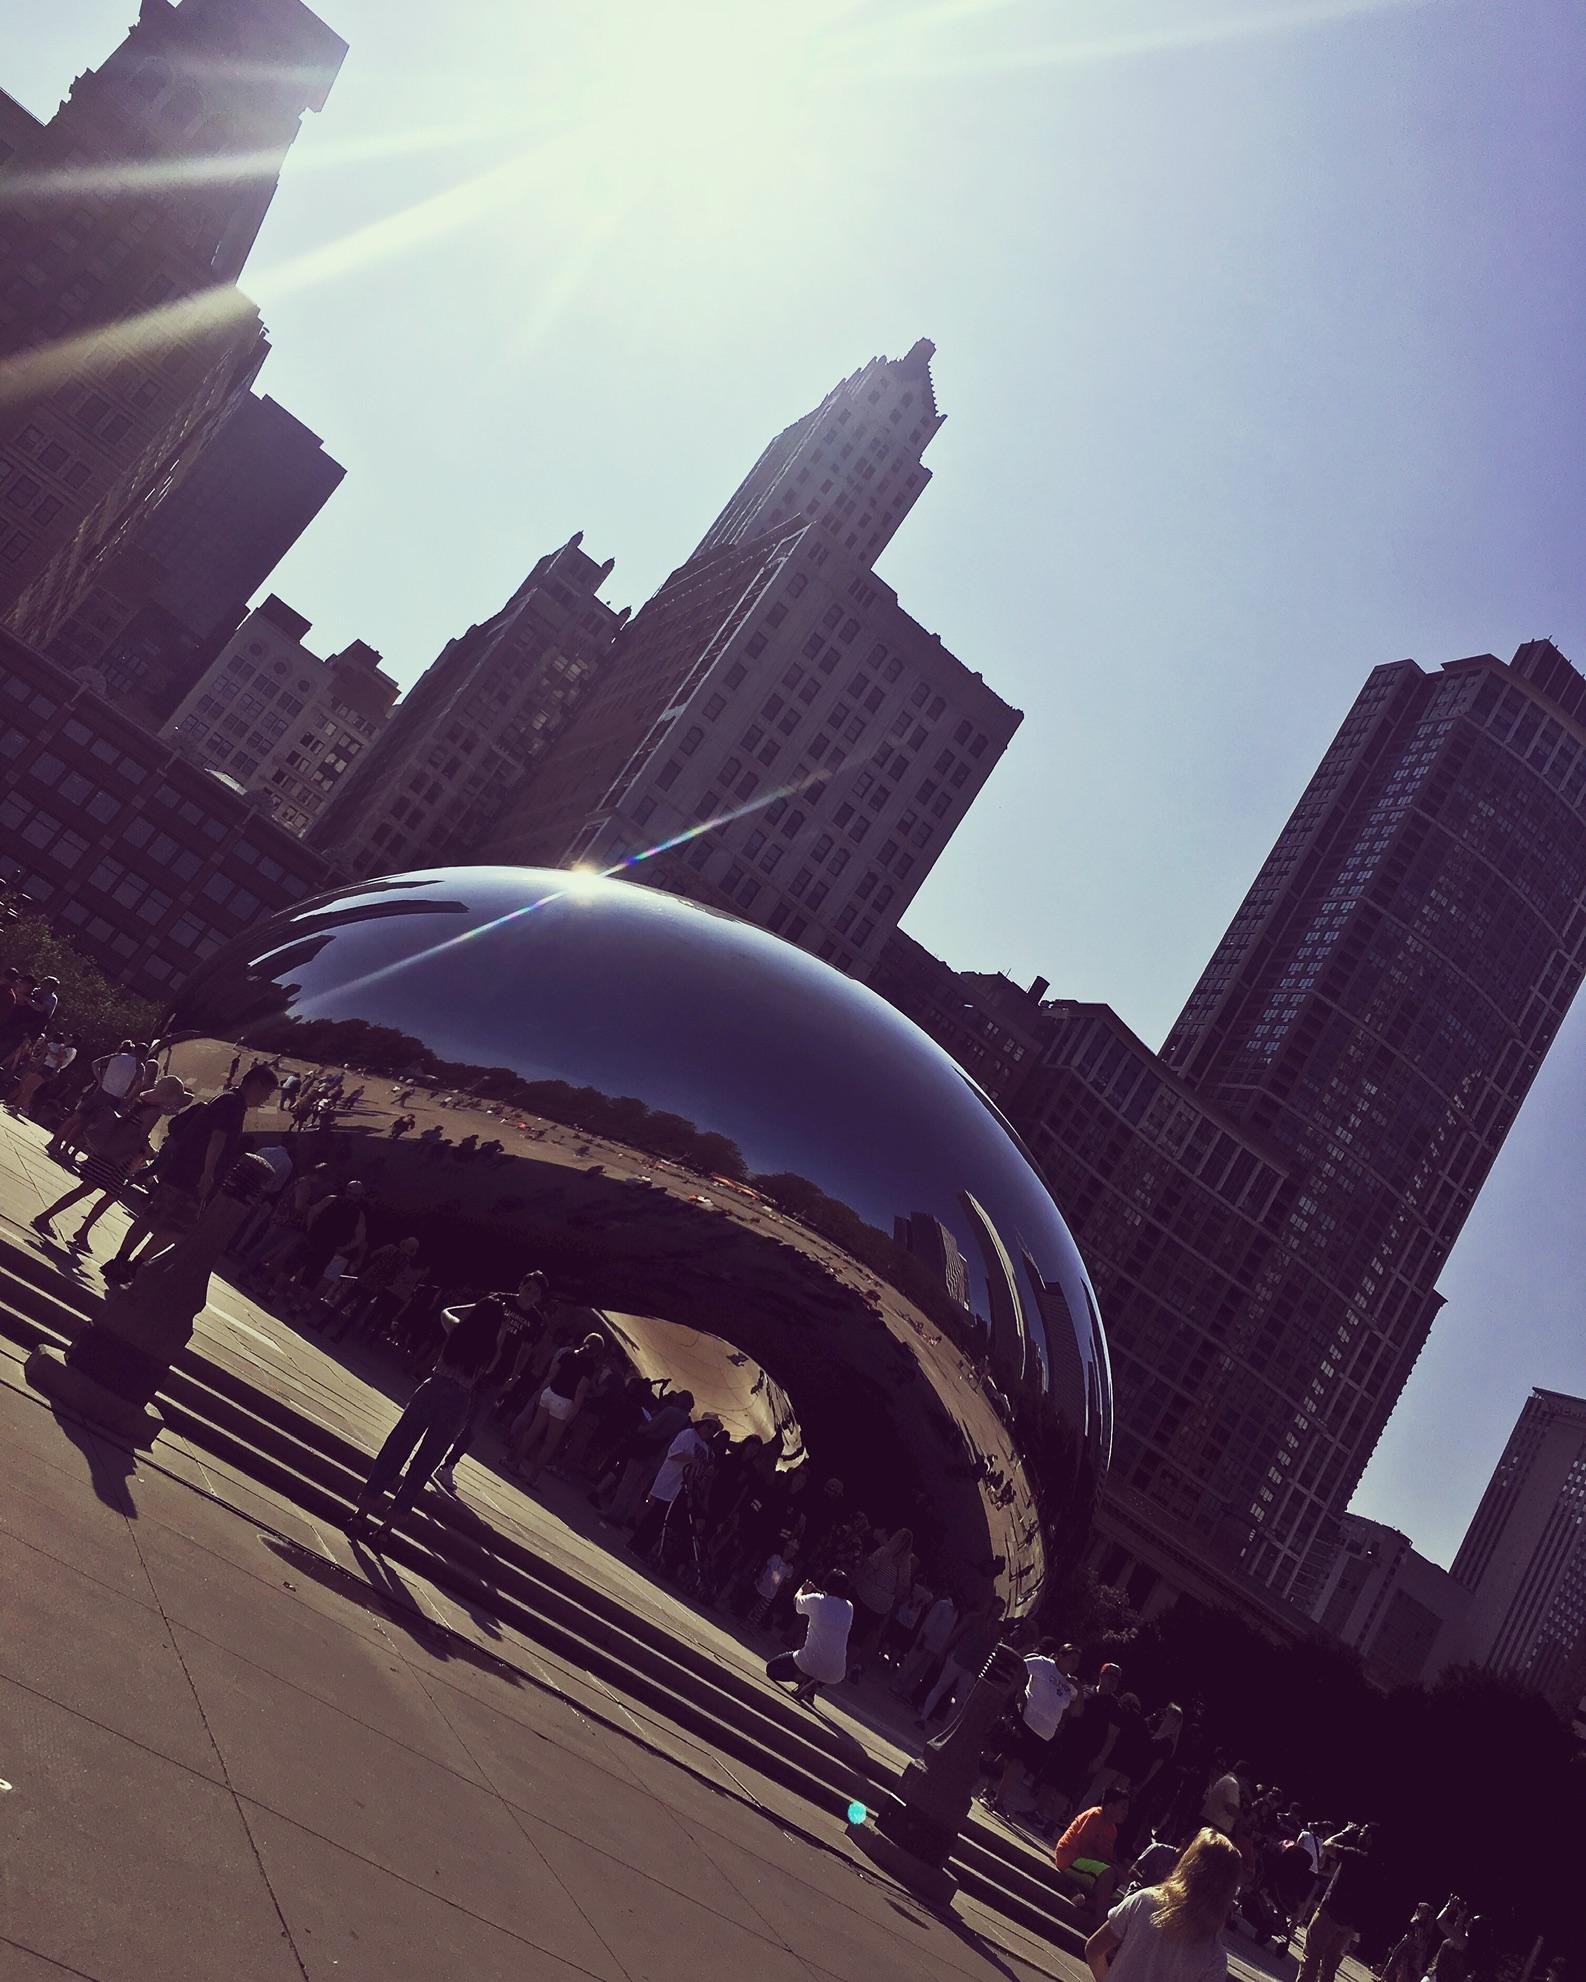 USA, Chicago, Millennium Park, Cloud Gate, fot. Viktoria Szczypińska